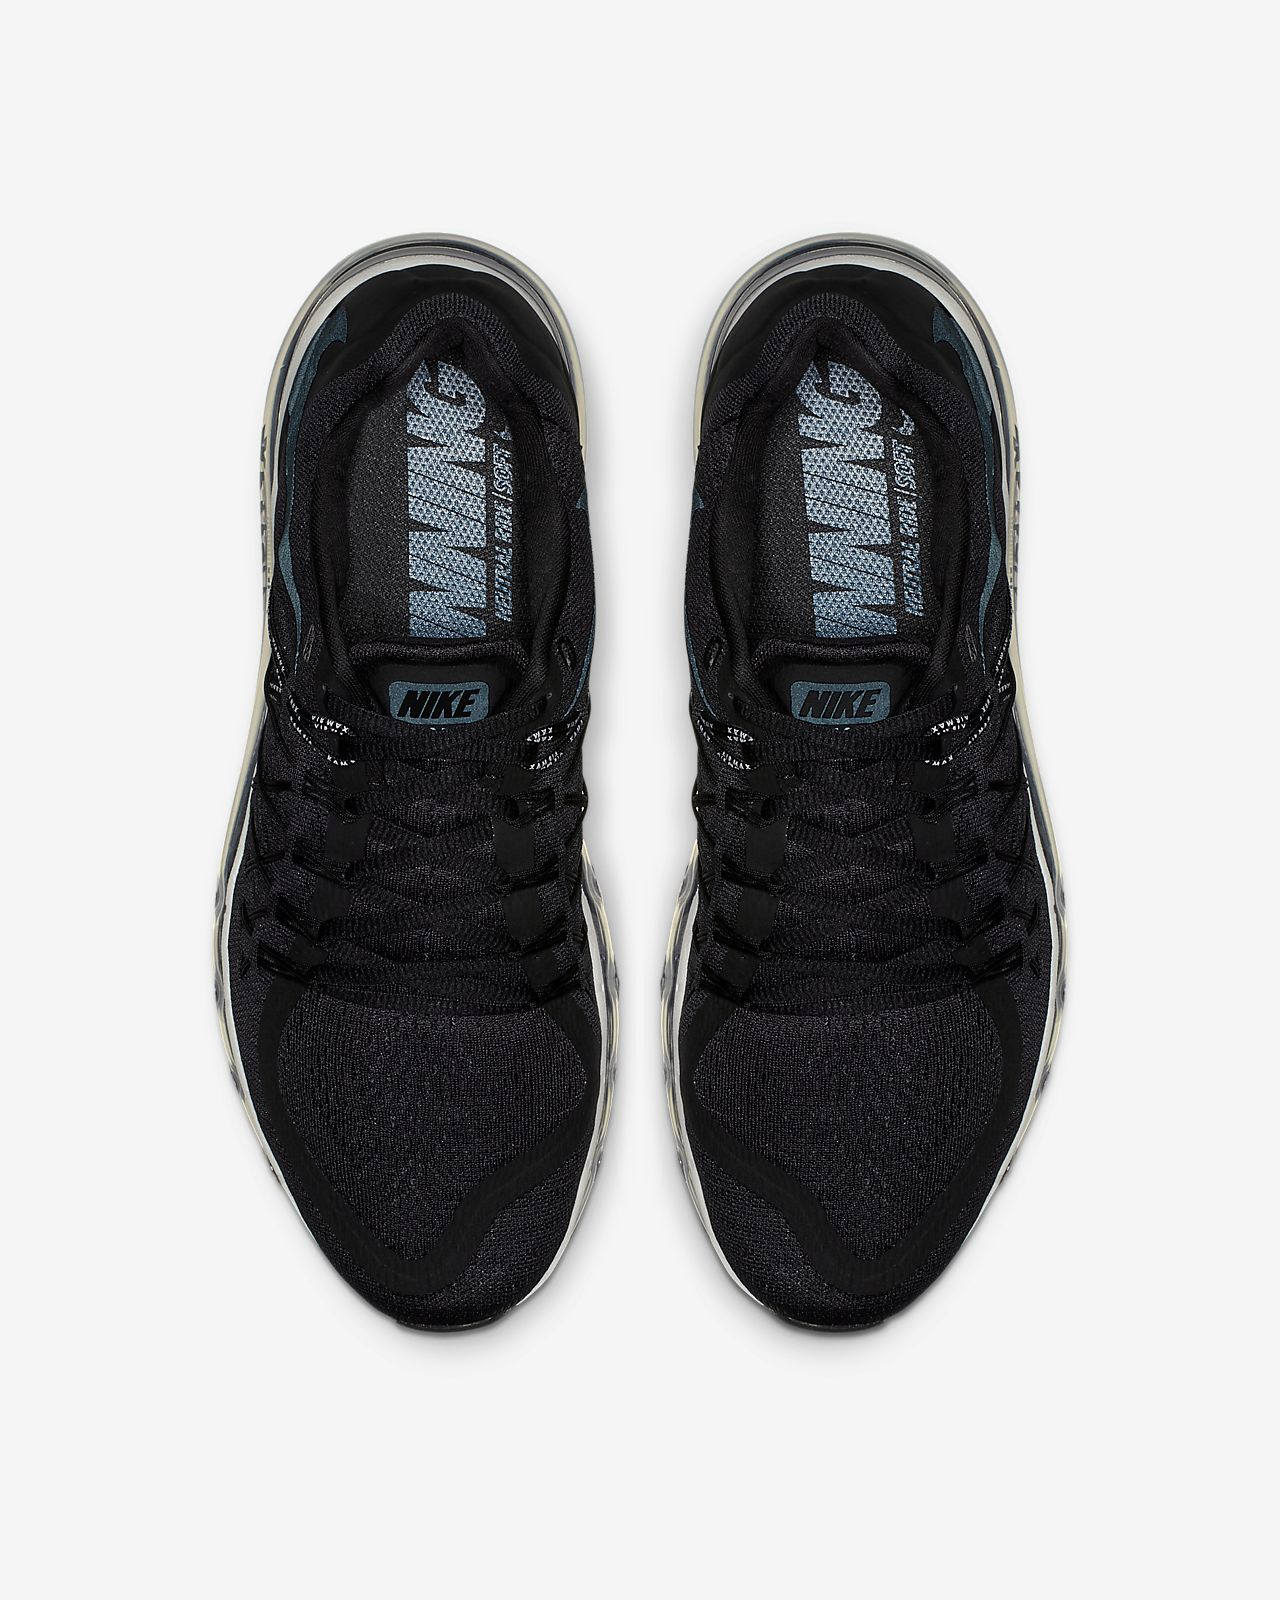 2ba625ba99d6 Nike Air Max 2015 Men s Shoe. Nike.com GB